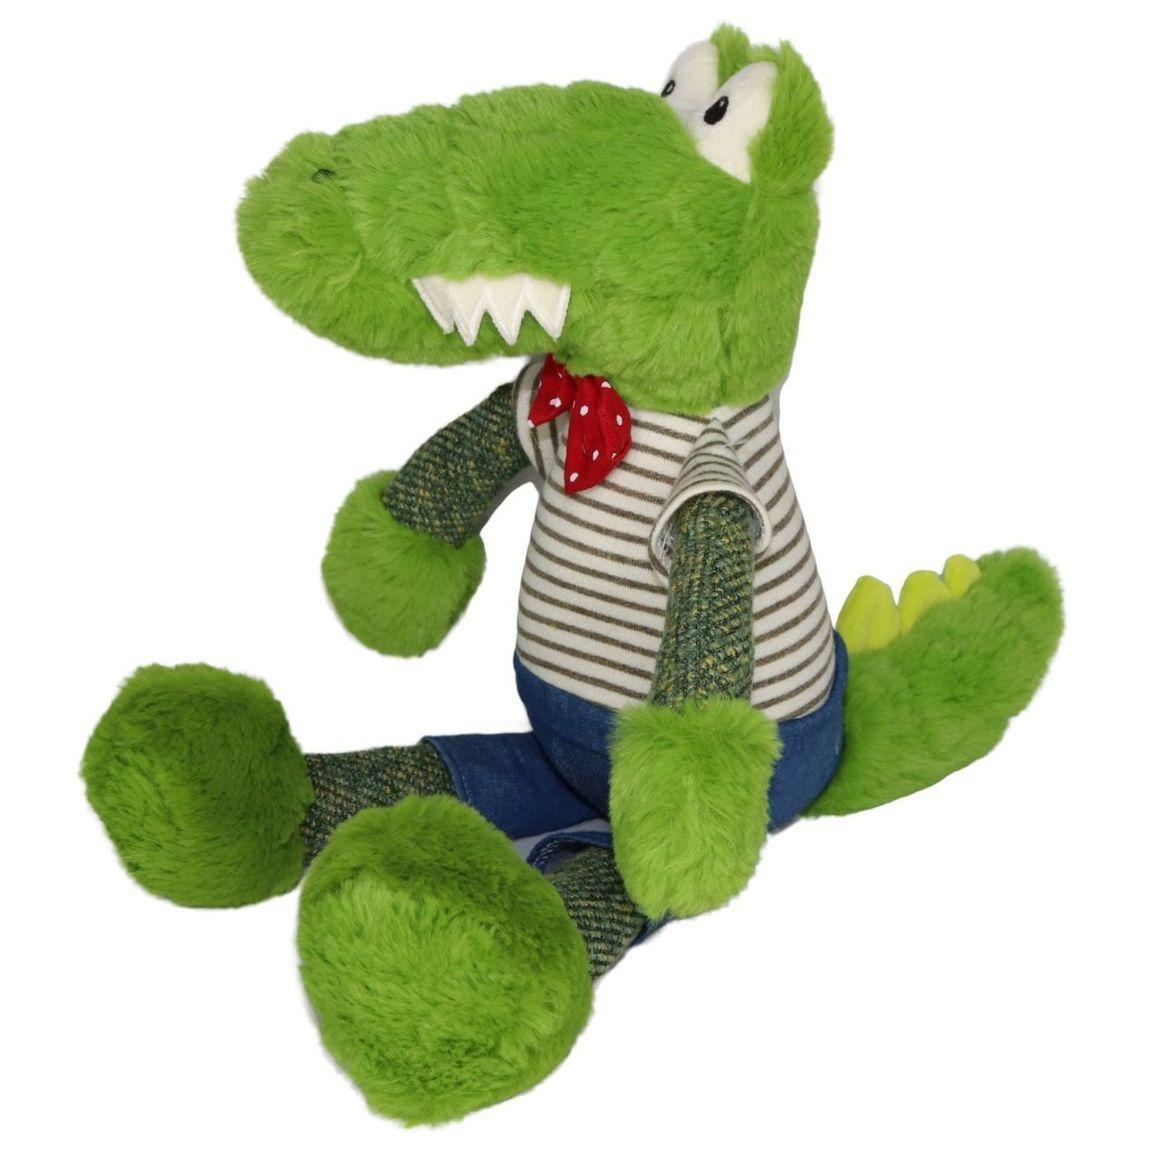 Plush Toy Crocodile - Red/White    Trada Marketplace